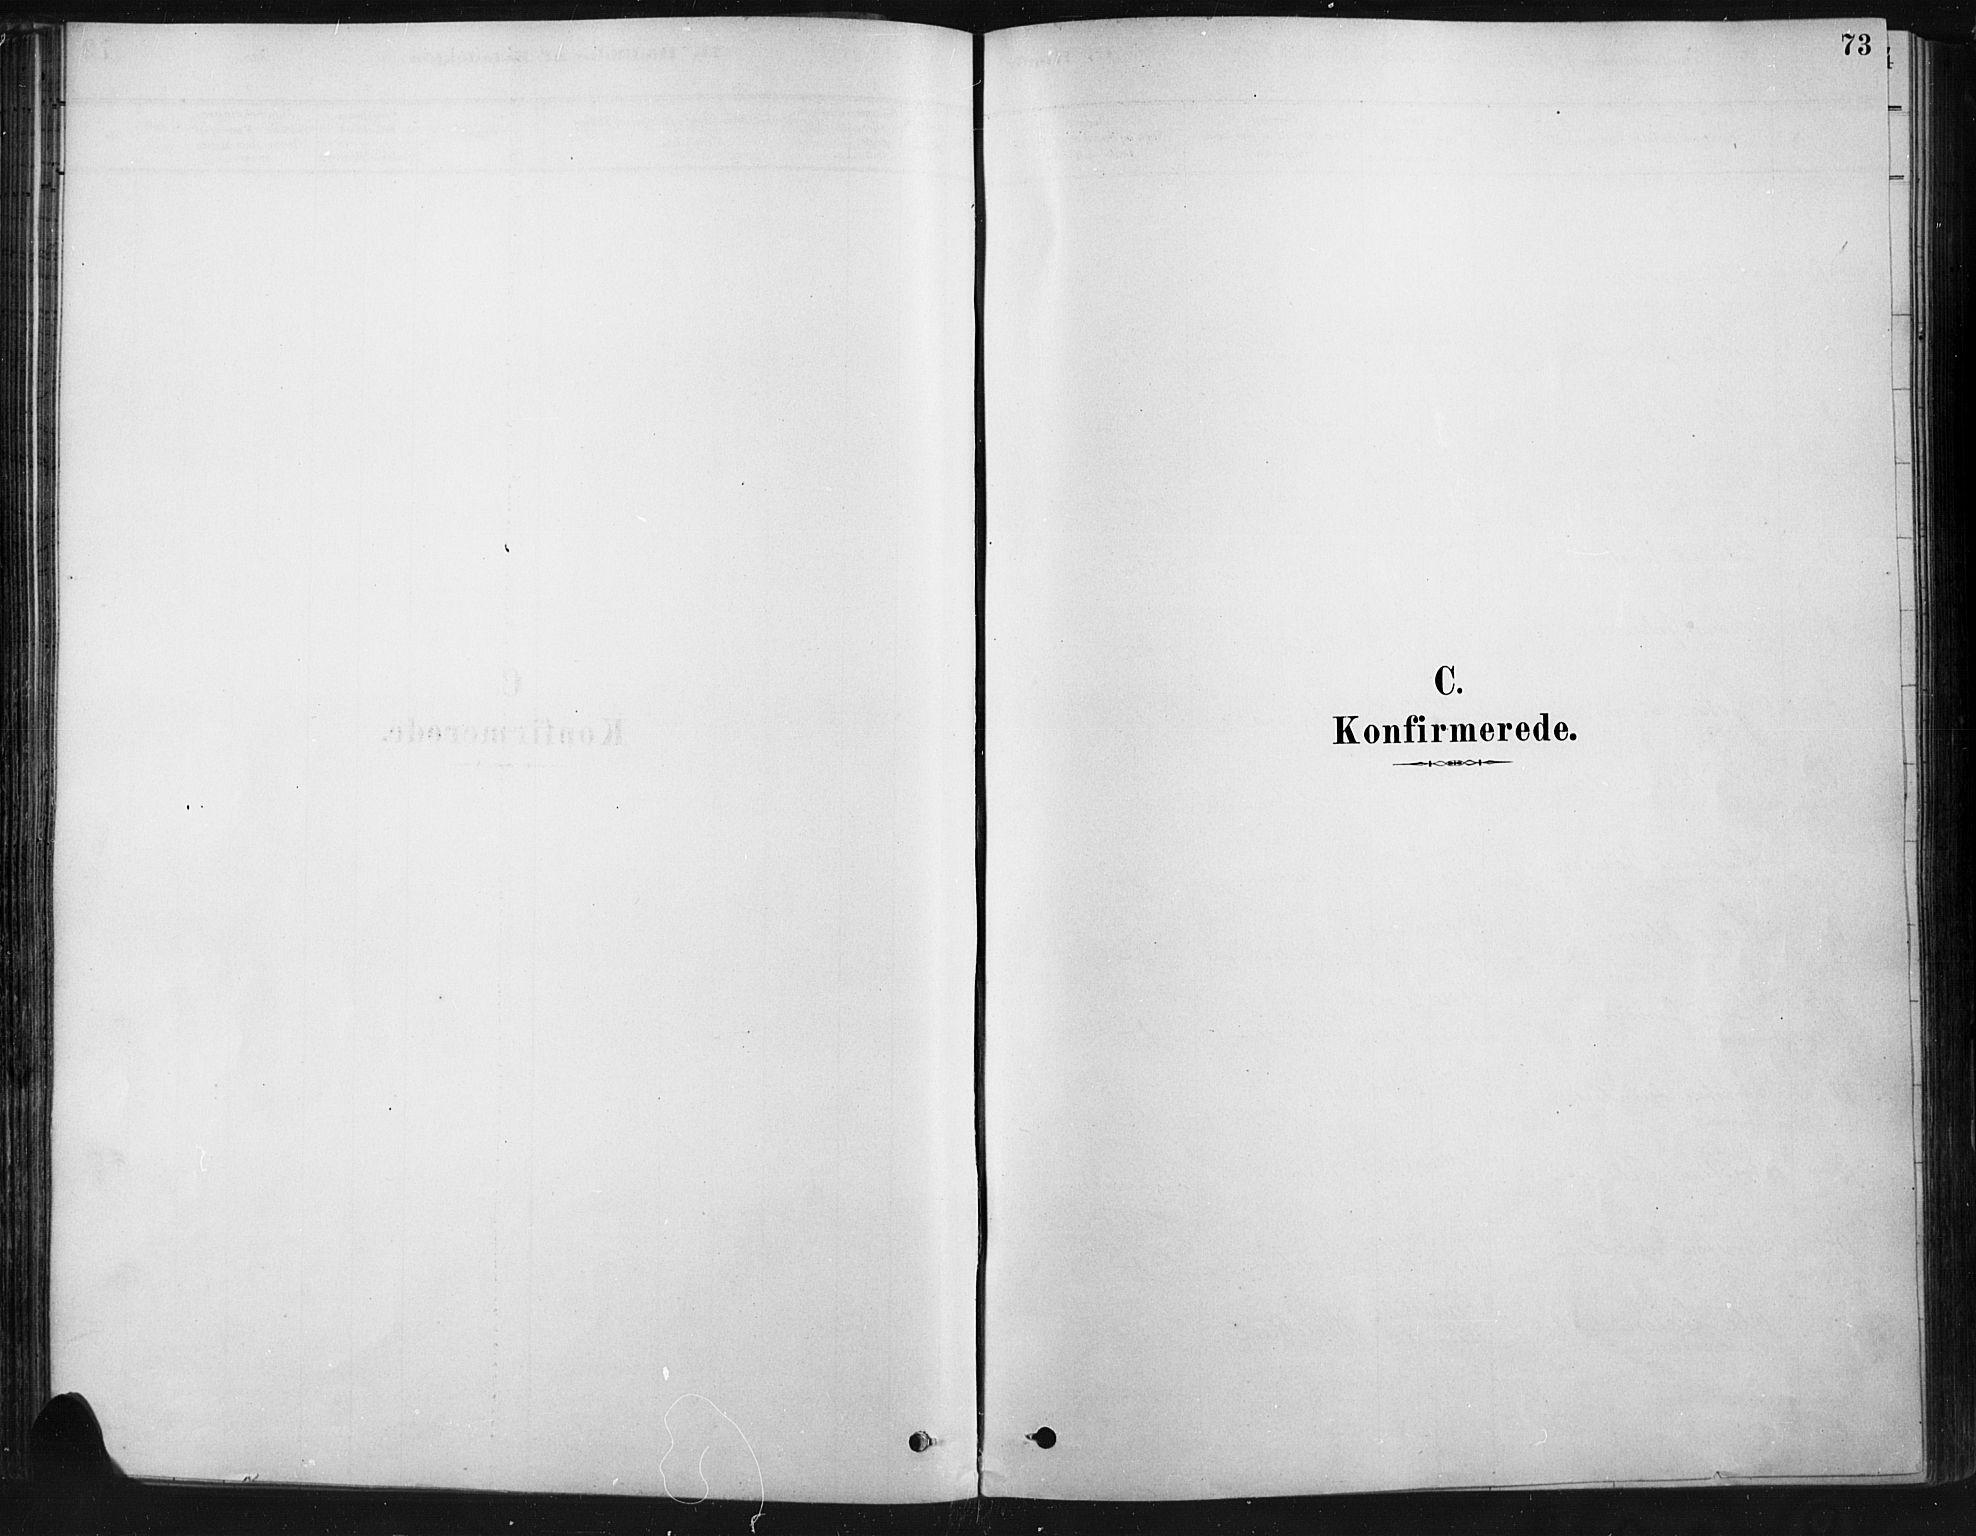 SAH, Ringebu prestekontor, Ministerialbok nr. 9, 1878-1898, s. 73